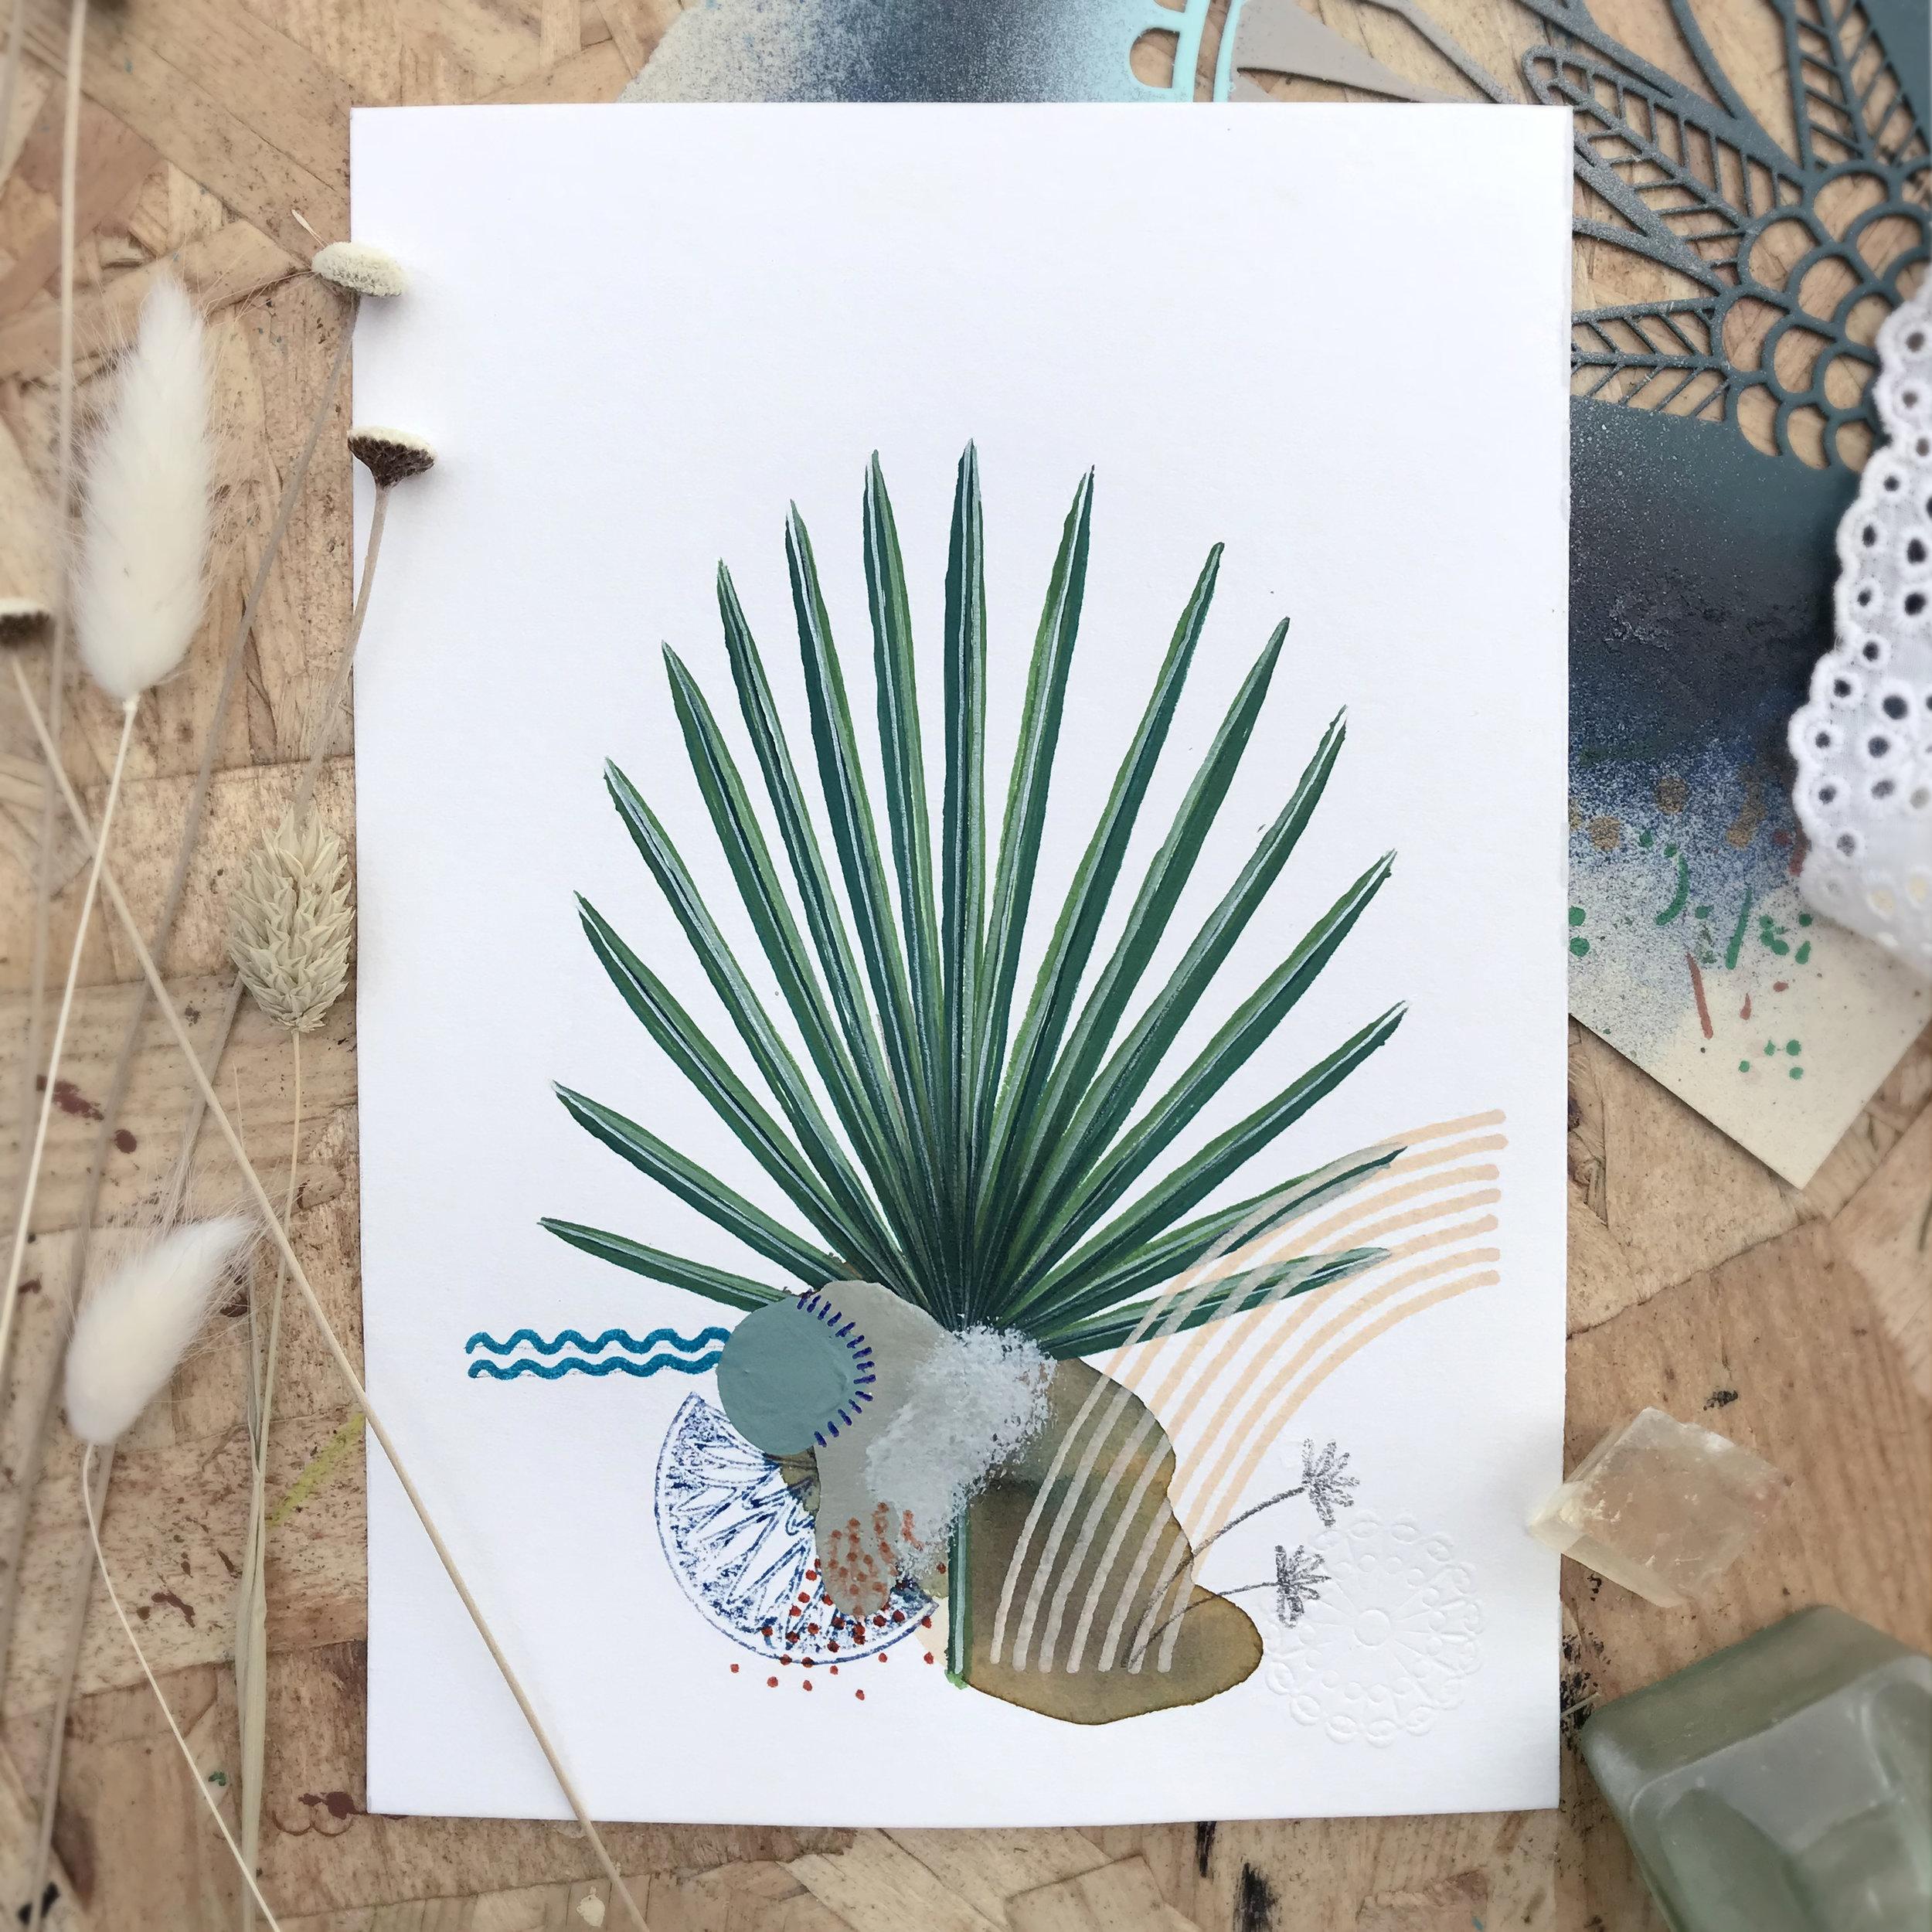 Malayia Adrikos  from Botanic garden, Herbarium - Mix media   2018